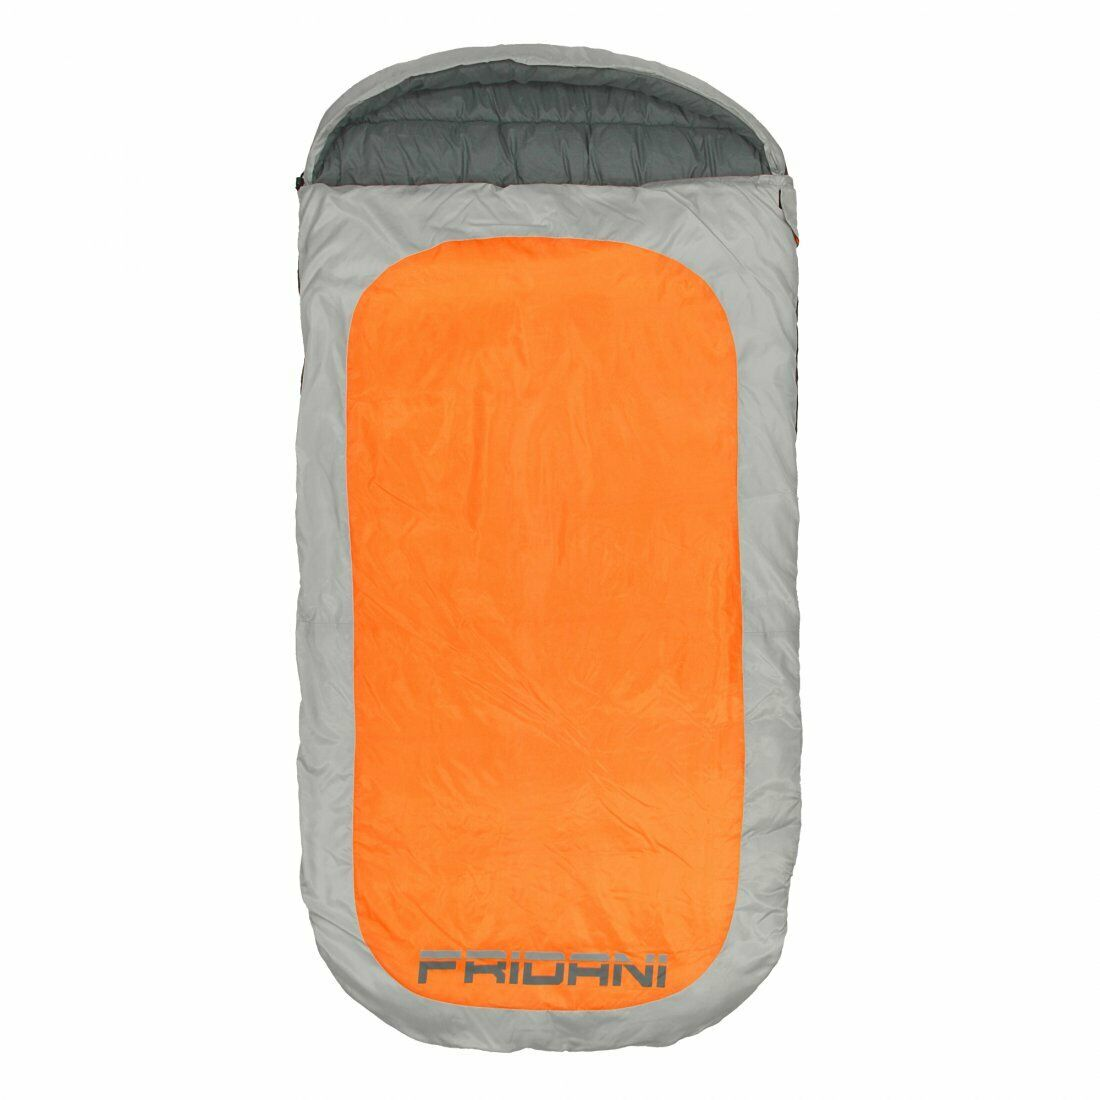 Blanket sleeping bag PO 220x110 XXL orange -18°C water-repellent washable